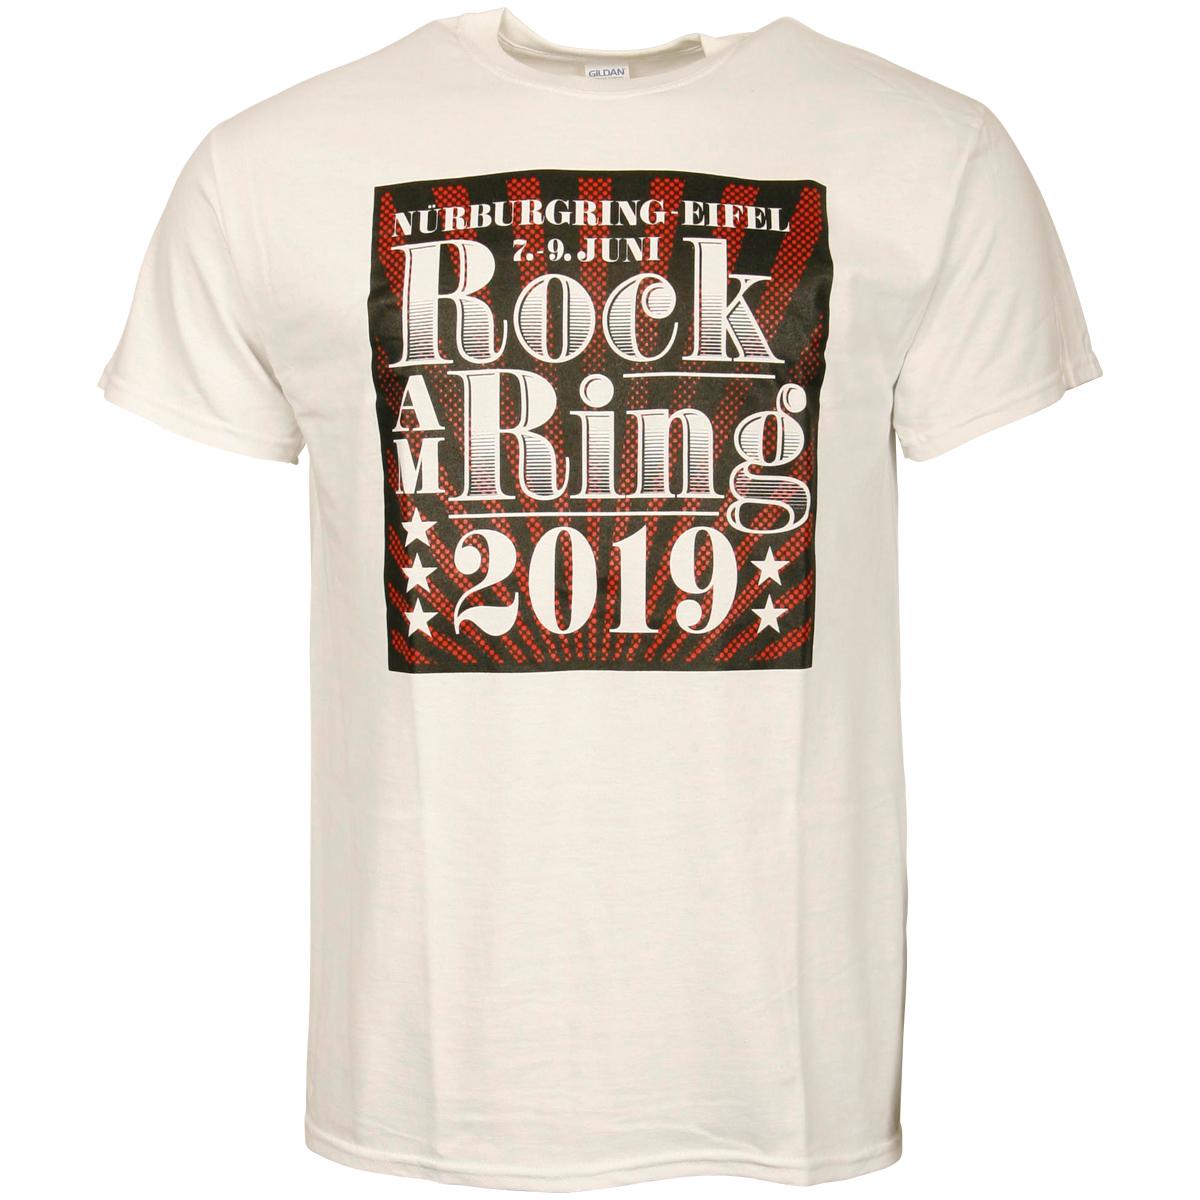 Rock am Ring 2019 -T-Shirt Classic Typo White - weiß